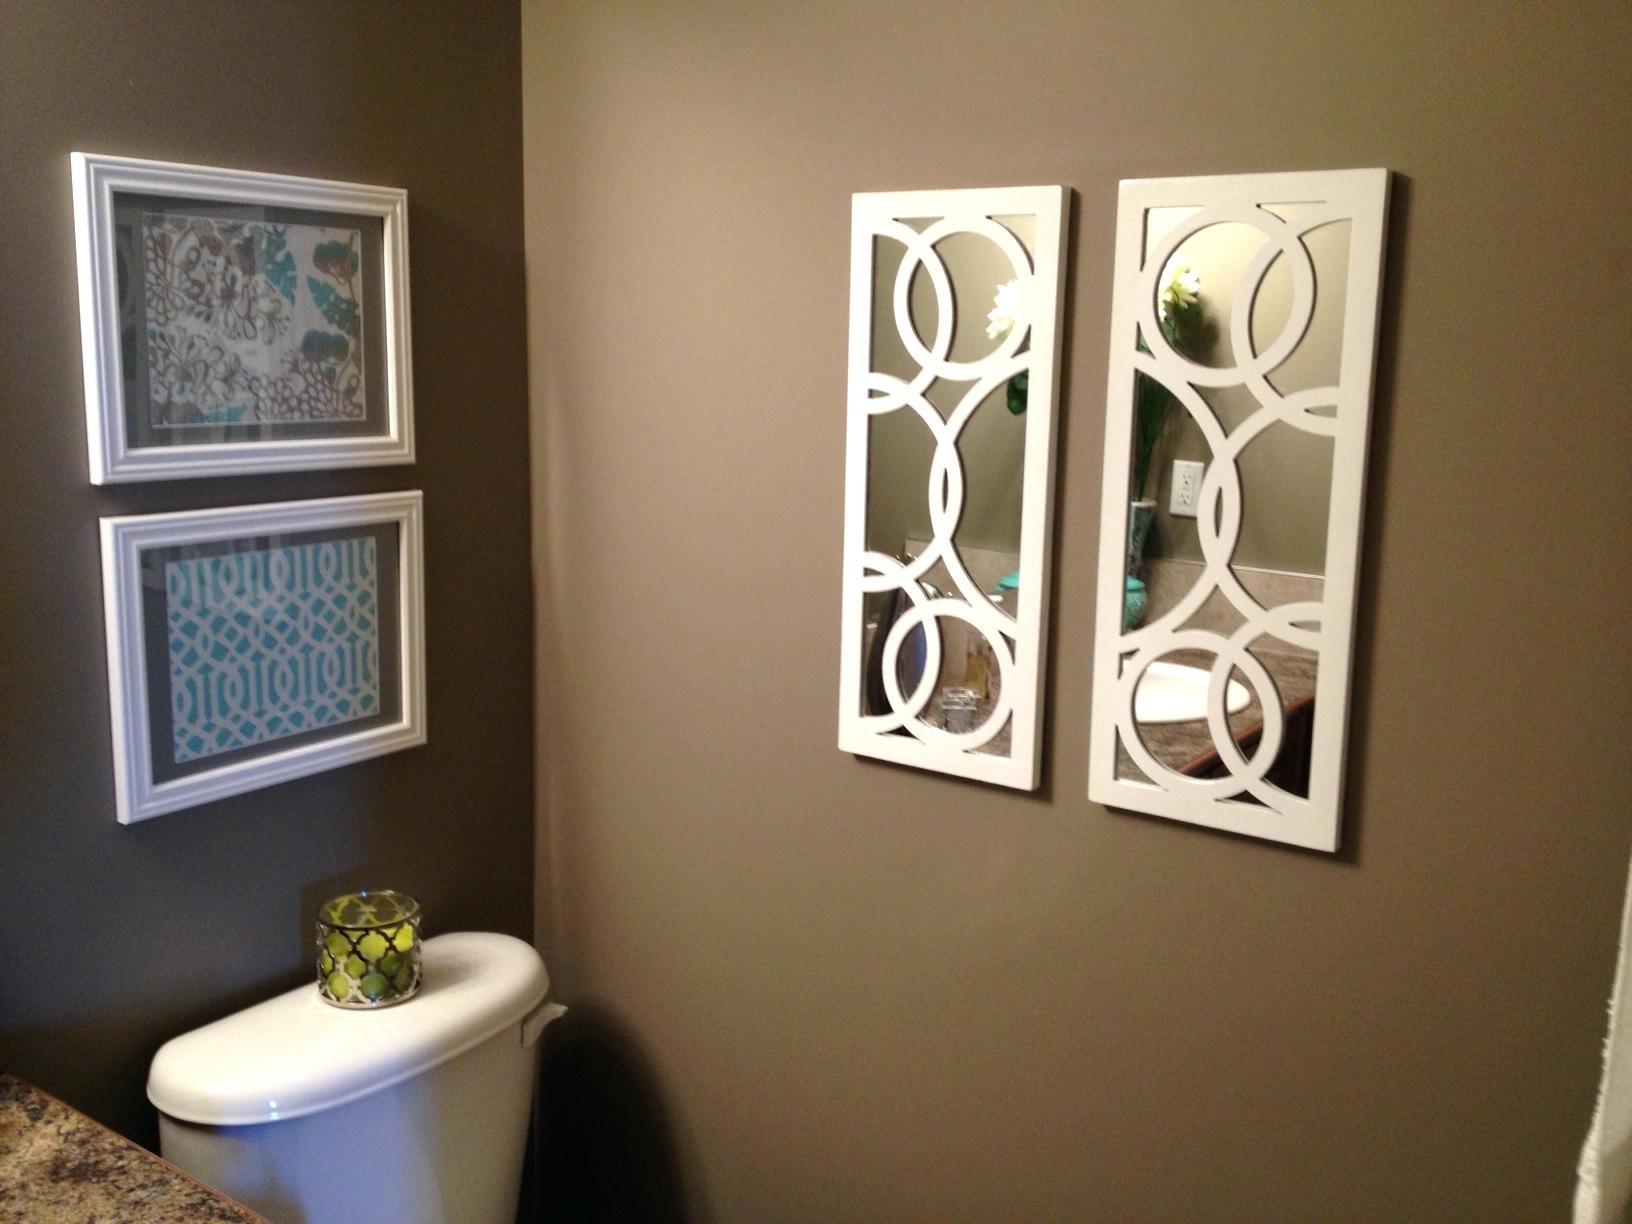 Furniture : Amazing Nicole Miller Bedding Tj Maxx New Wall Ideas In Newest Tj Maxx Wall Art (View 2 of 15)